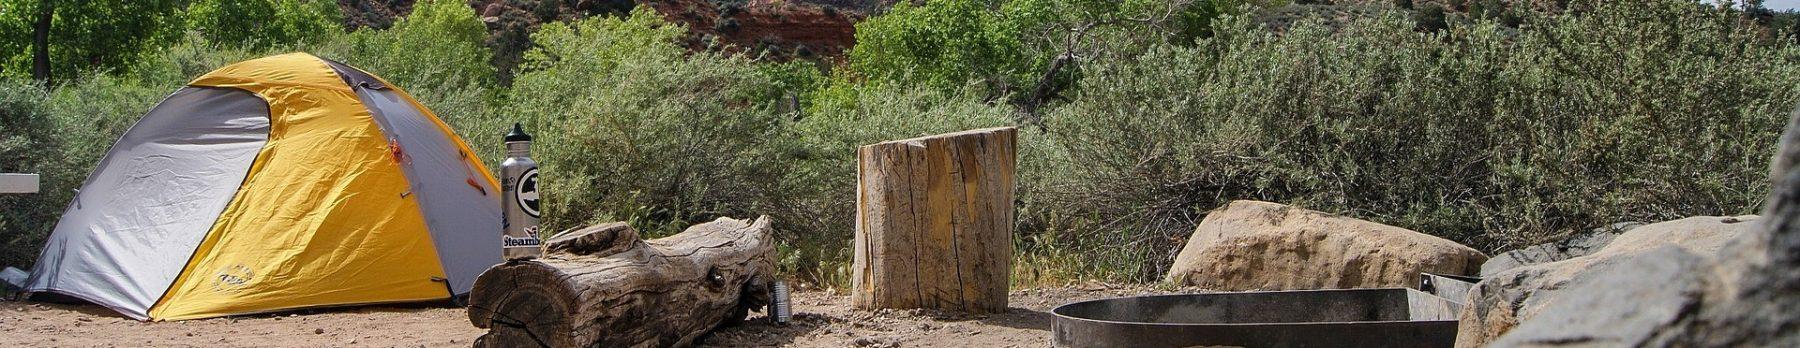 Campingbett Test